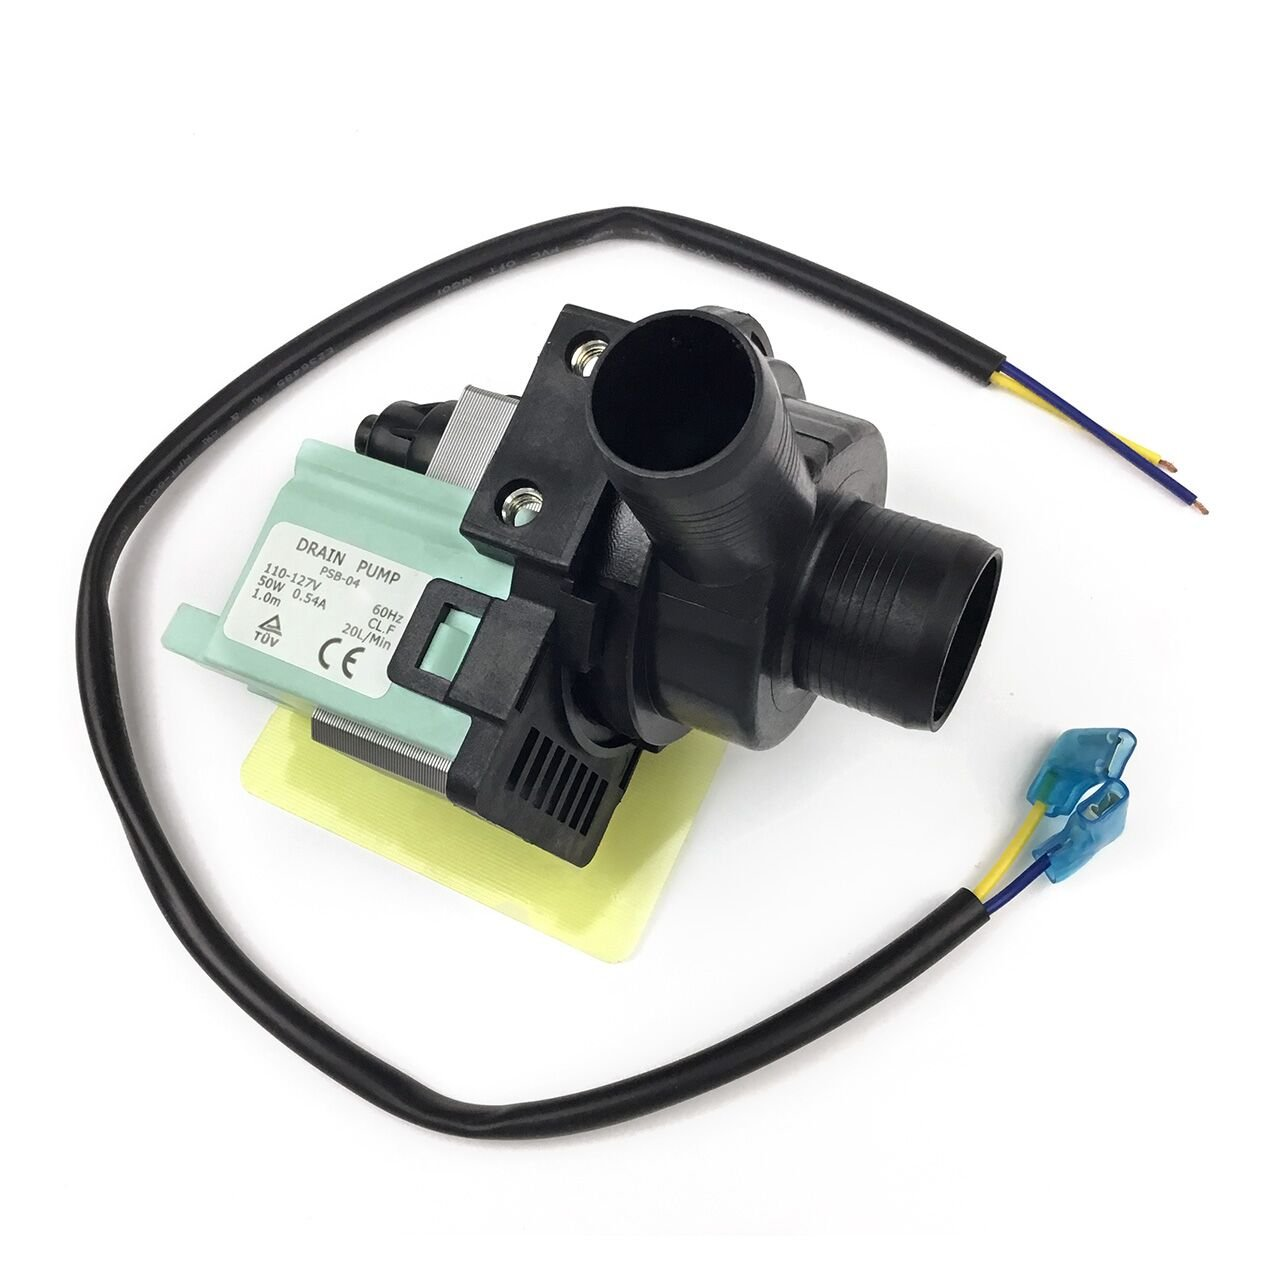 Sikawai 35-6780 Drain Pump Replacement Part Compatible with GE Magic Chef Crosley Amana Washing Machine Replacecs 21001906 35-6465 WP35-6465 21002240 1480289 AP4372886